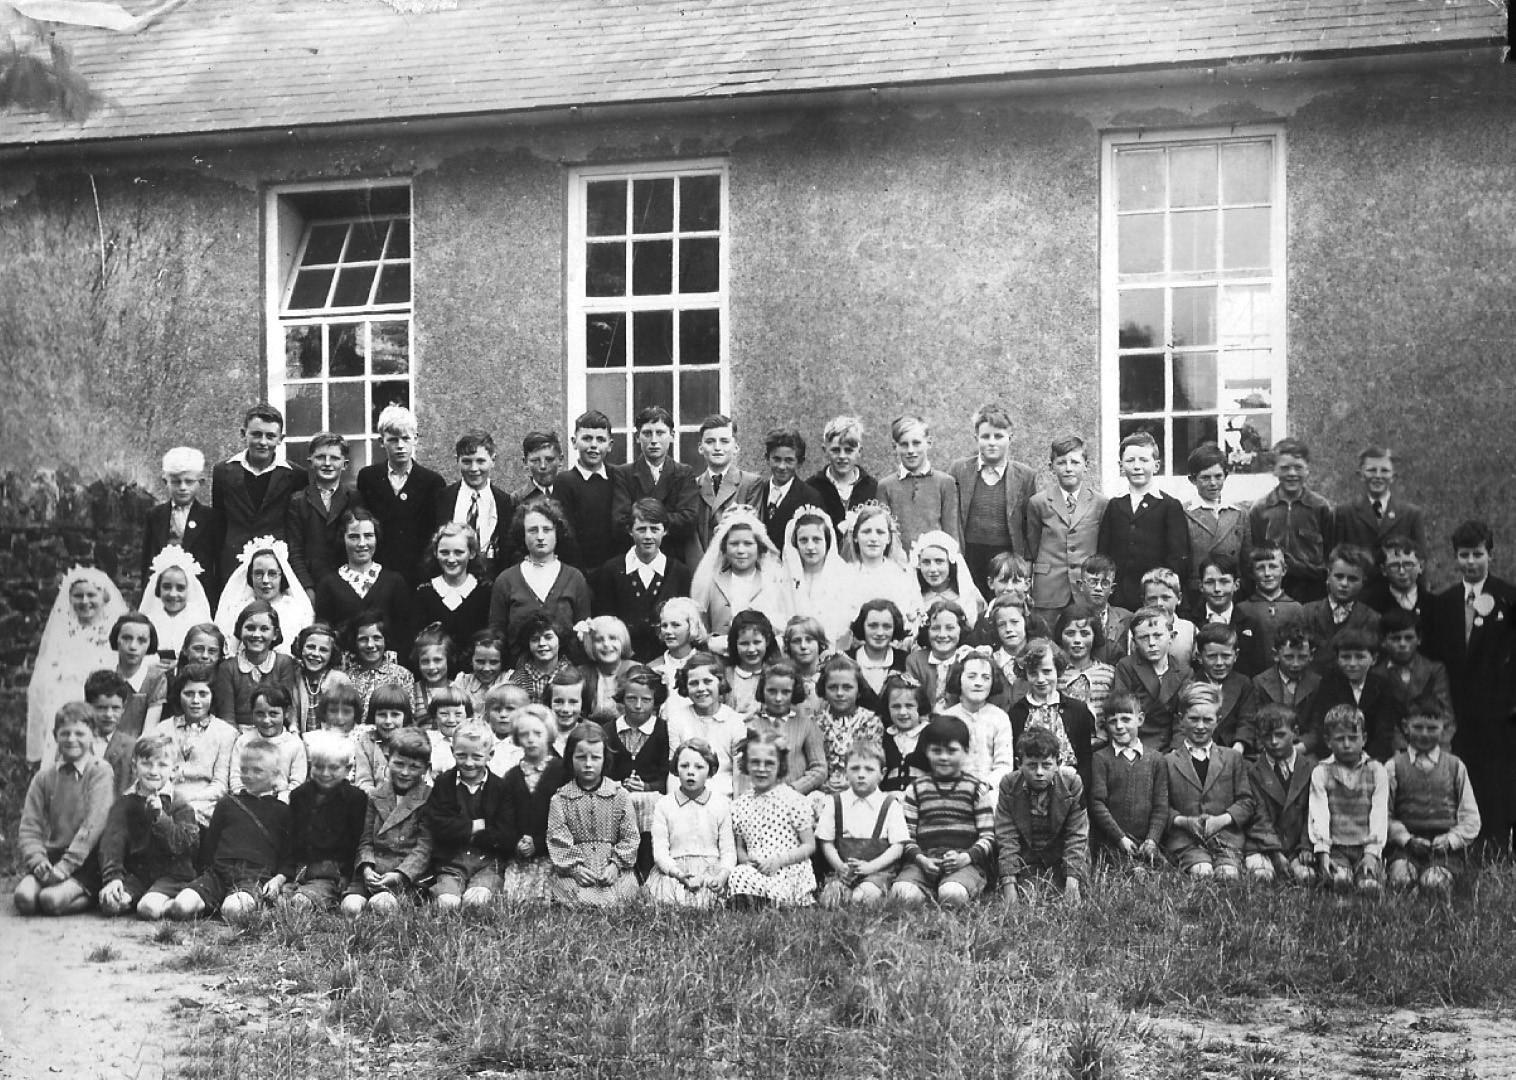 Bannow Historical Society Wexford Calendar 2014 7